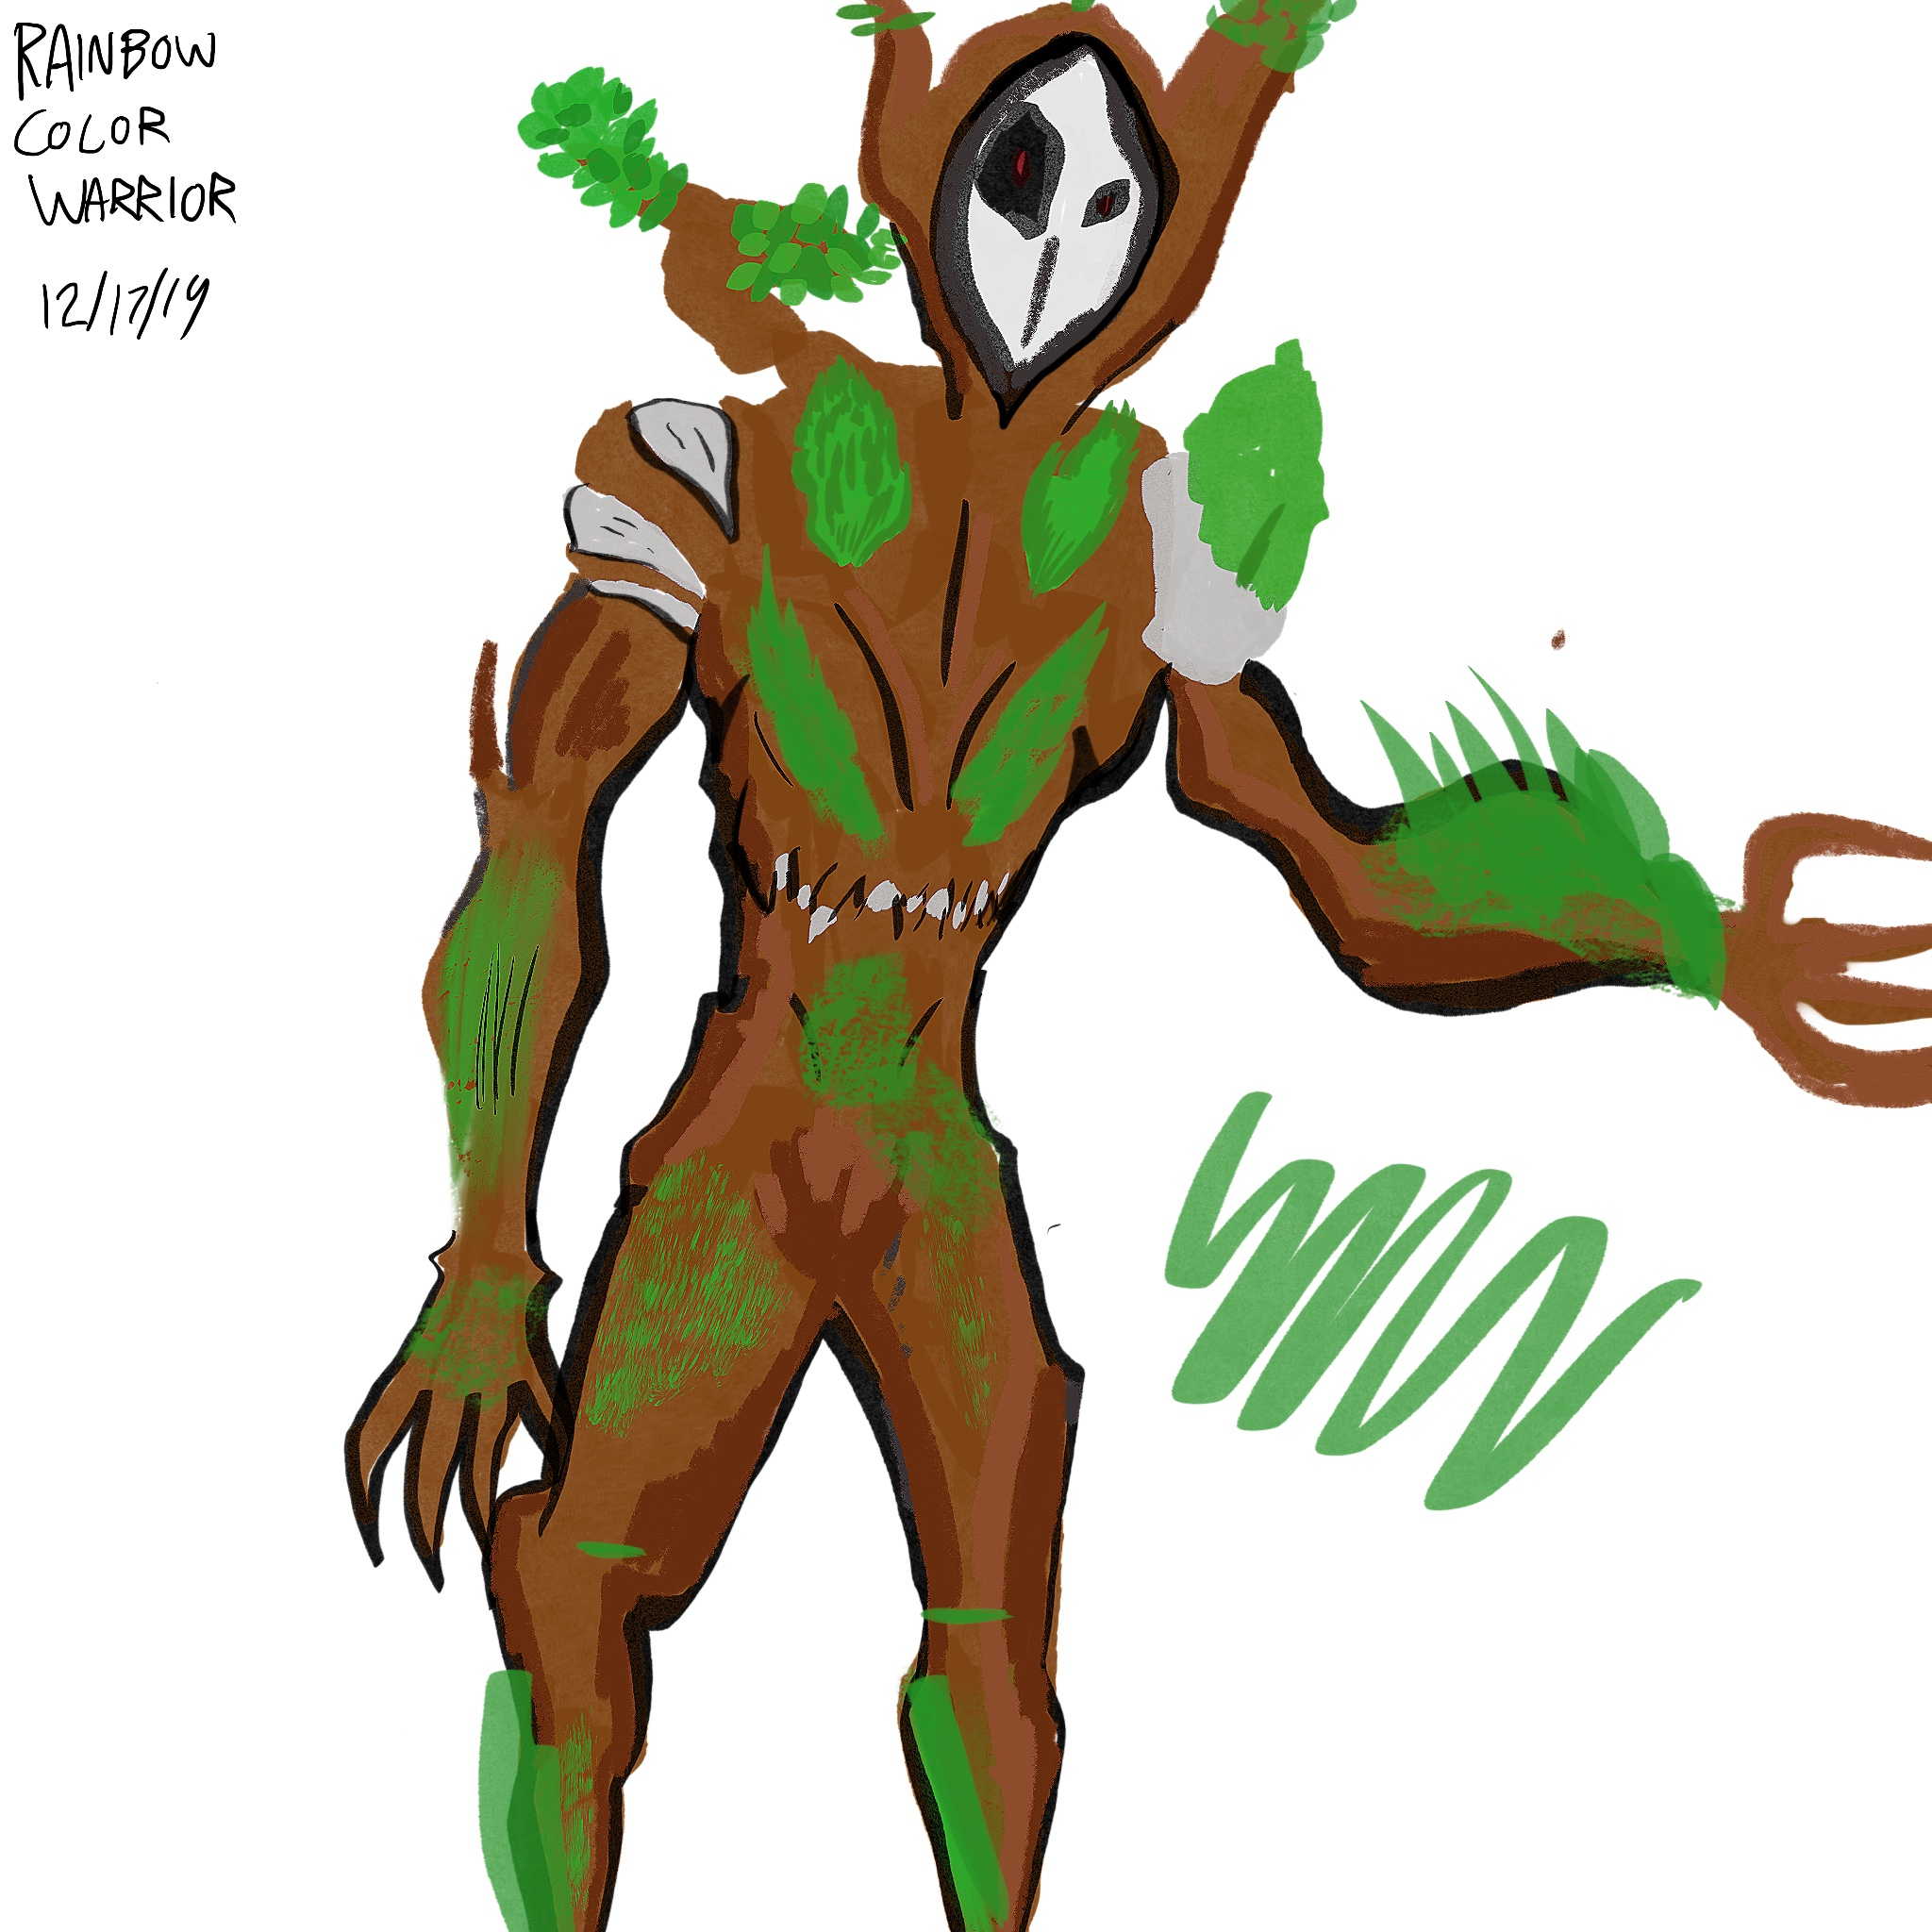 Tree Monster By Rainbowcolorwarrior On Deviantart 16,000+ vectors, stock photos & psd files. deviantart